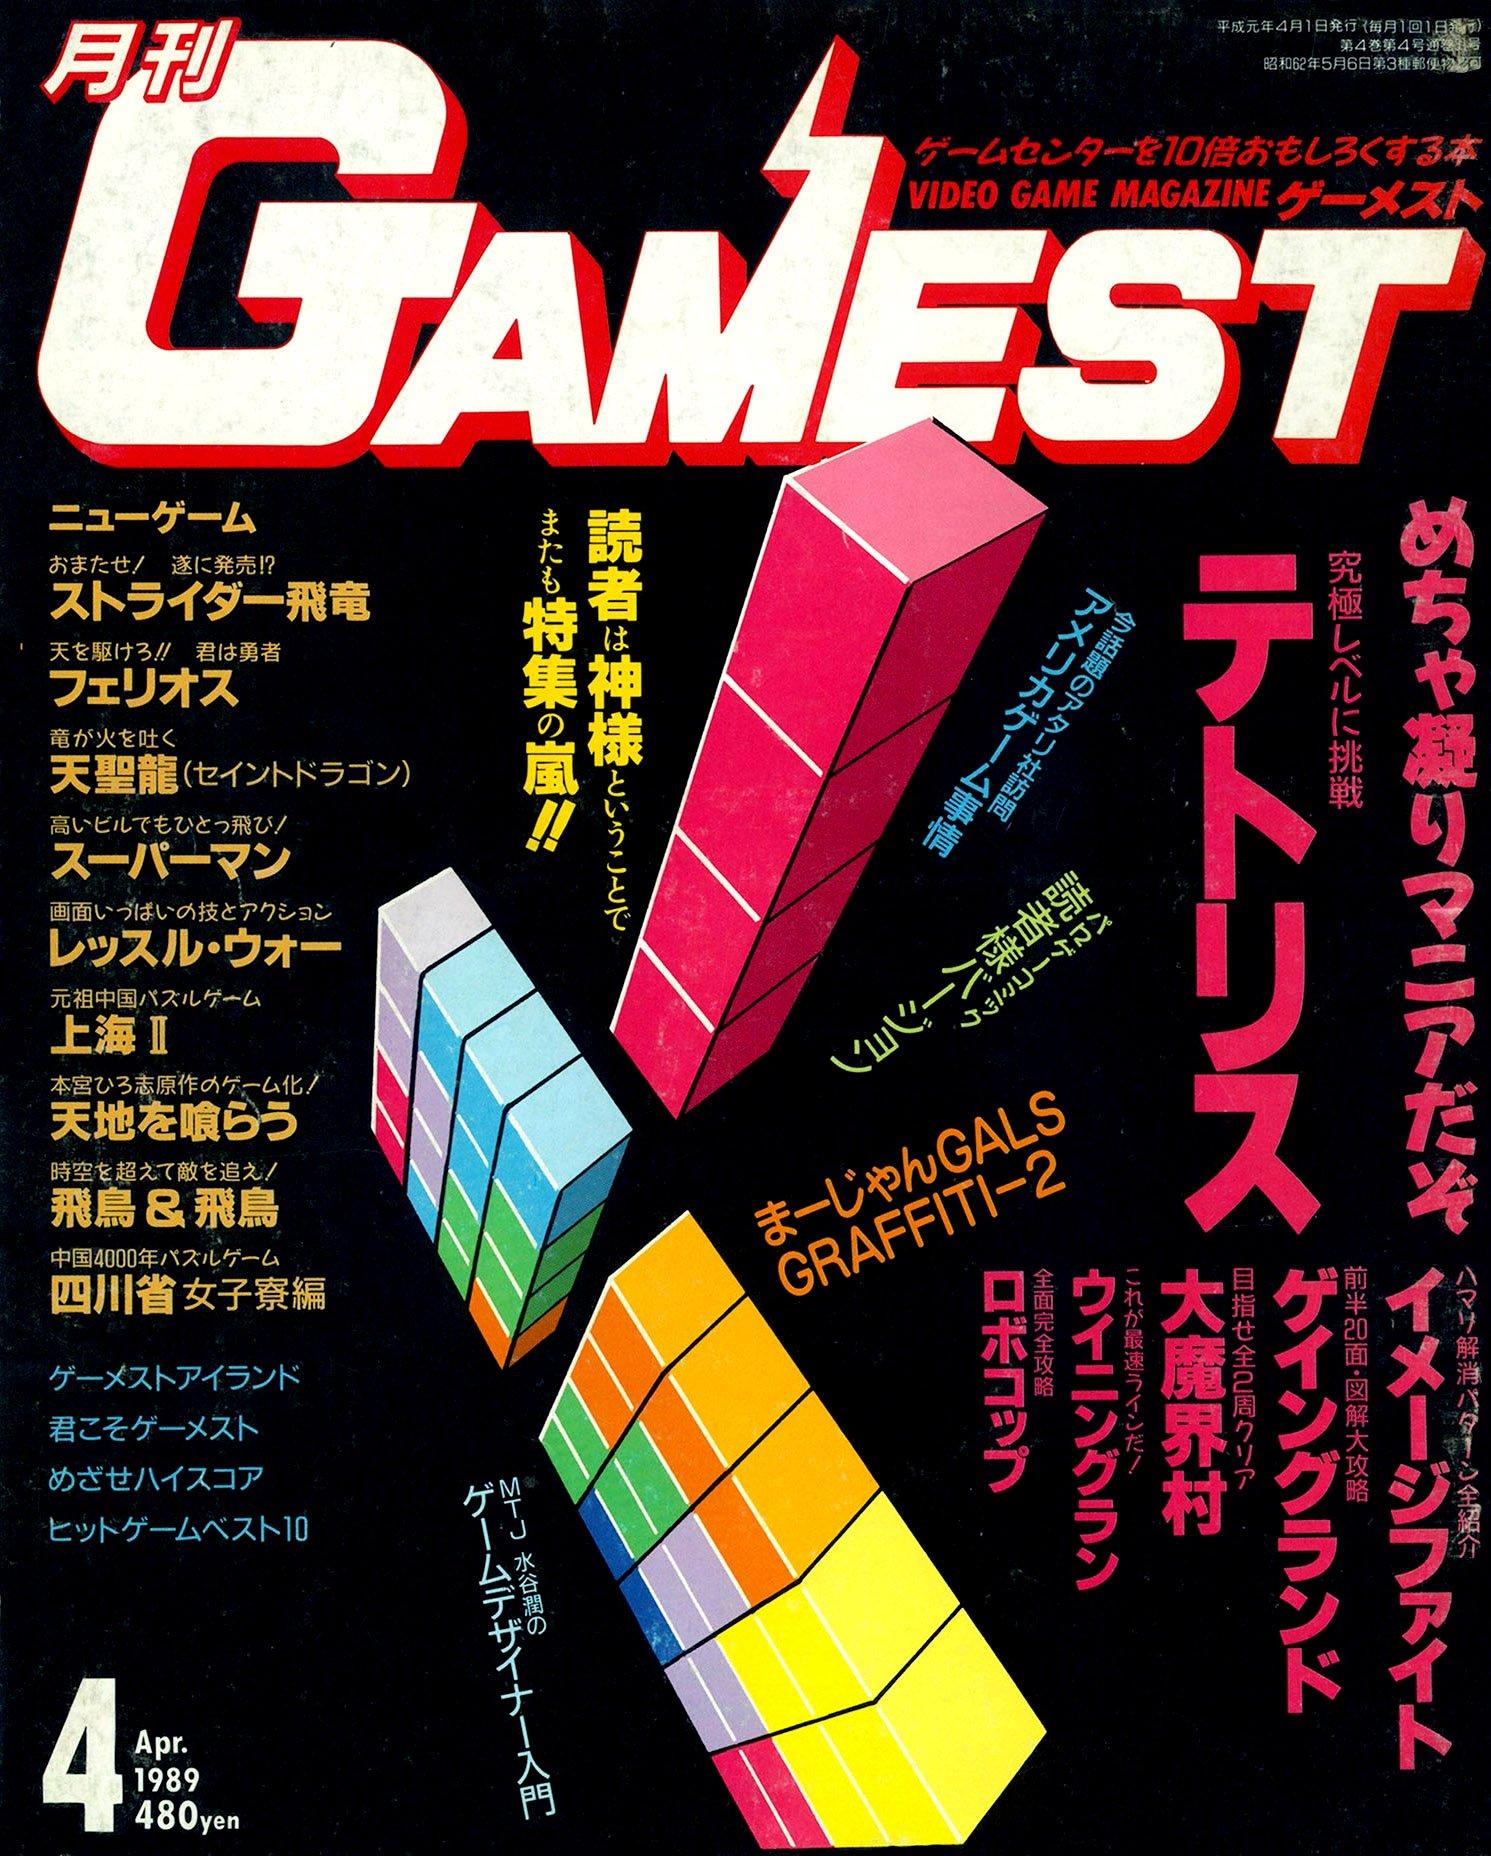 Gamest 031 (April 1989)